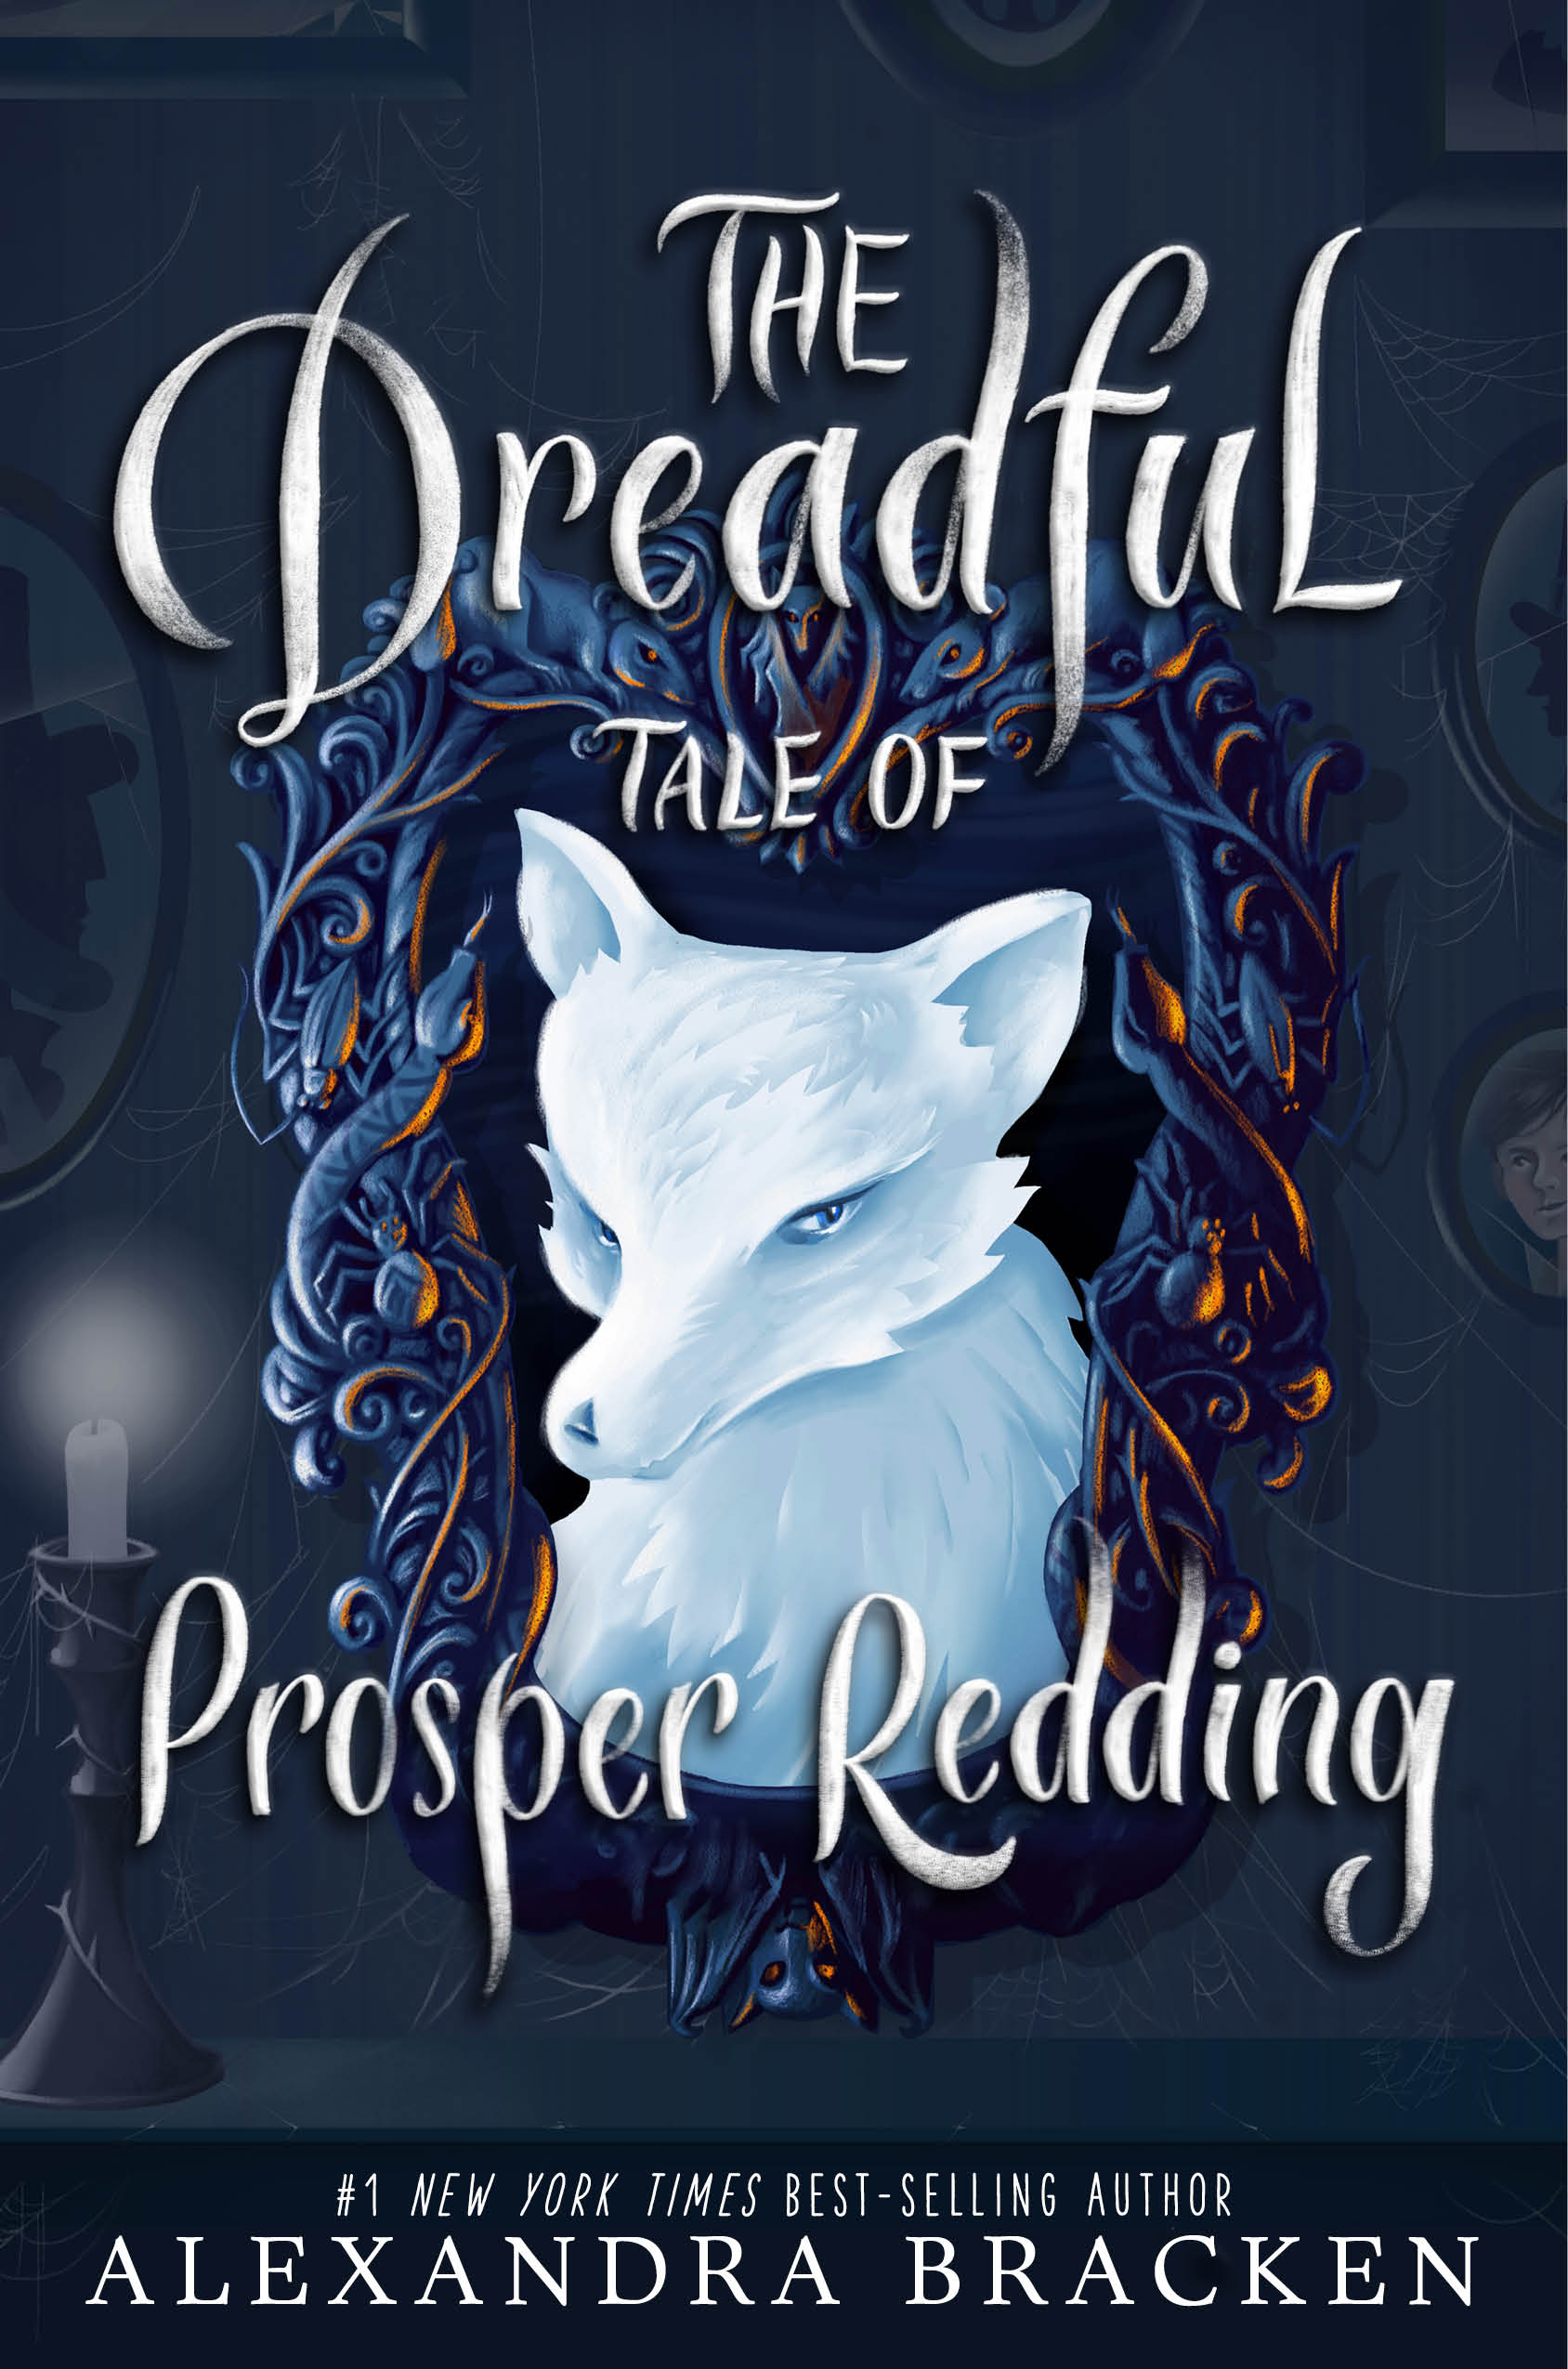 Read Chapters 1 & 2 of The Dreadful Tale of Prosper Redding Before It's Release!